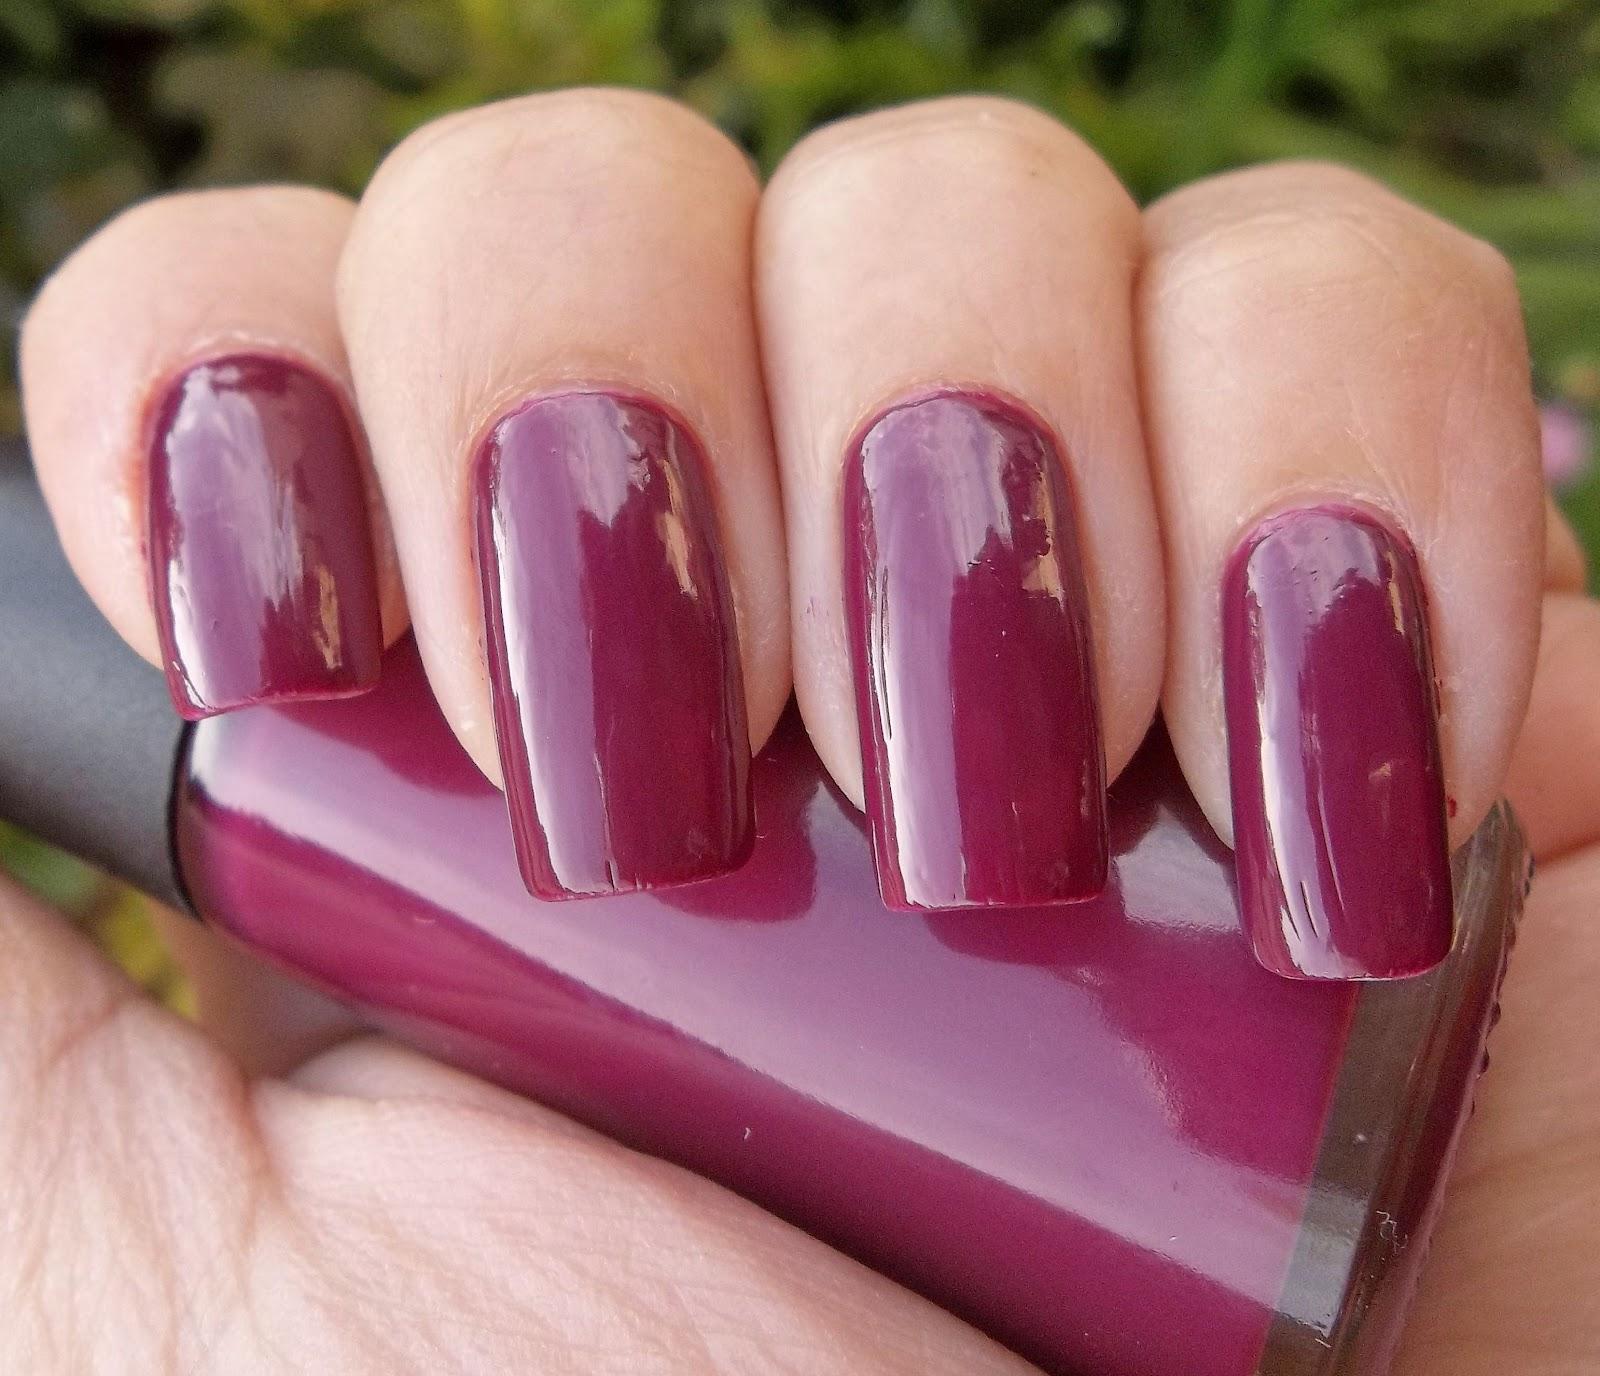 miss phibes.: Avon Color Trend Seducción + experimento con sombra dorada